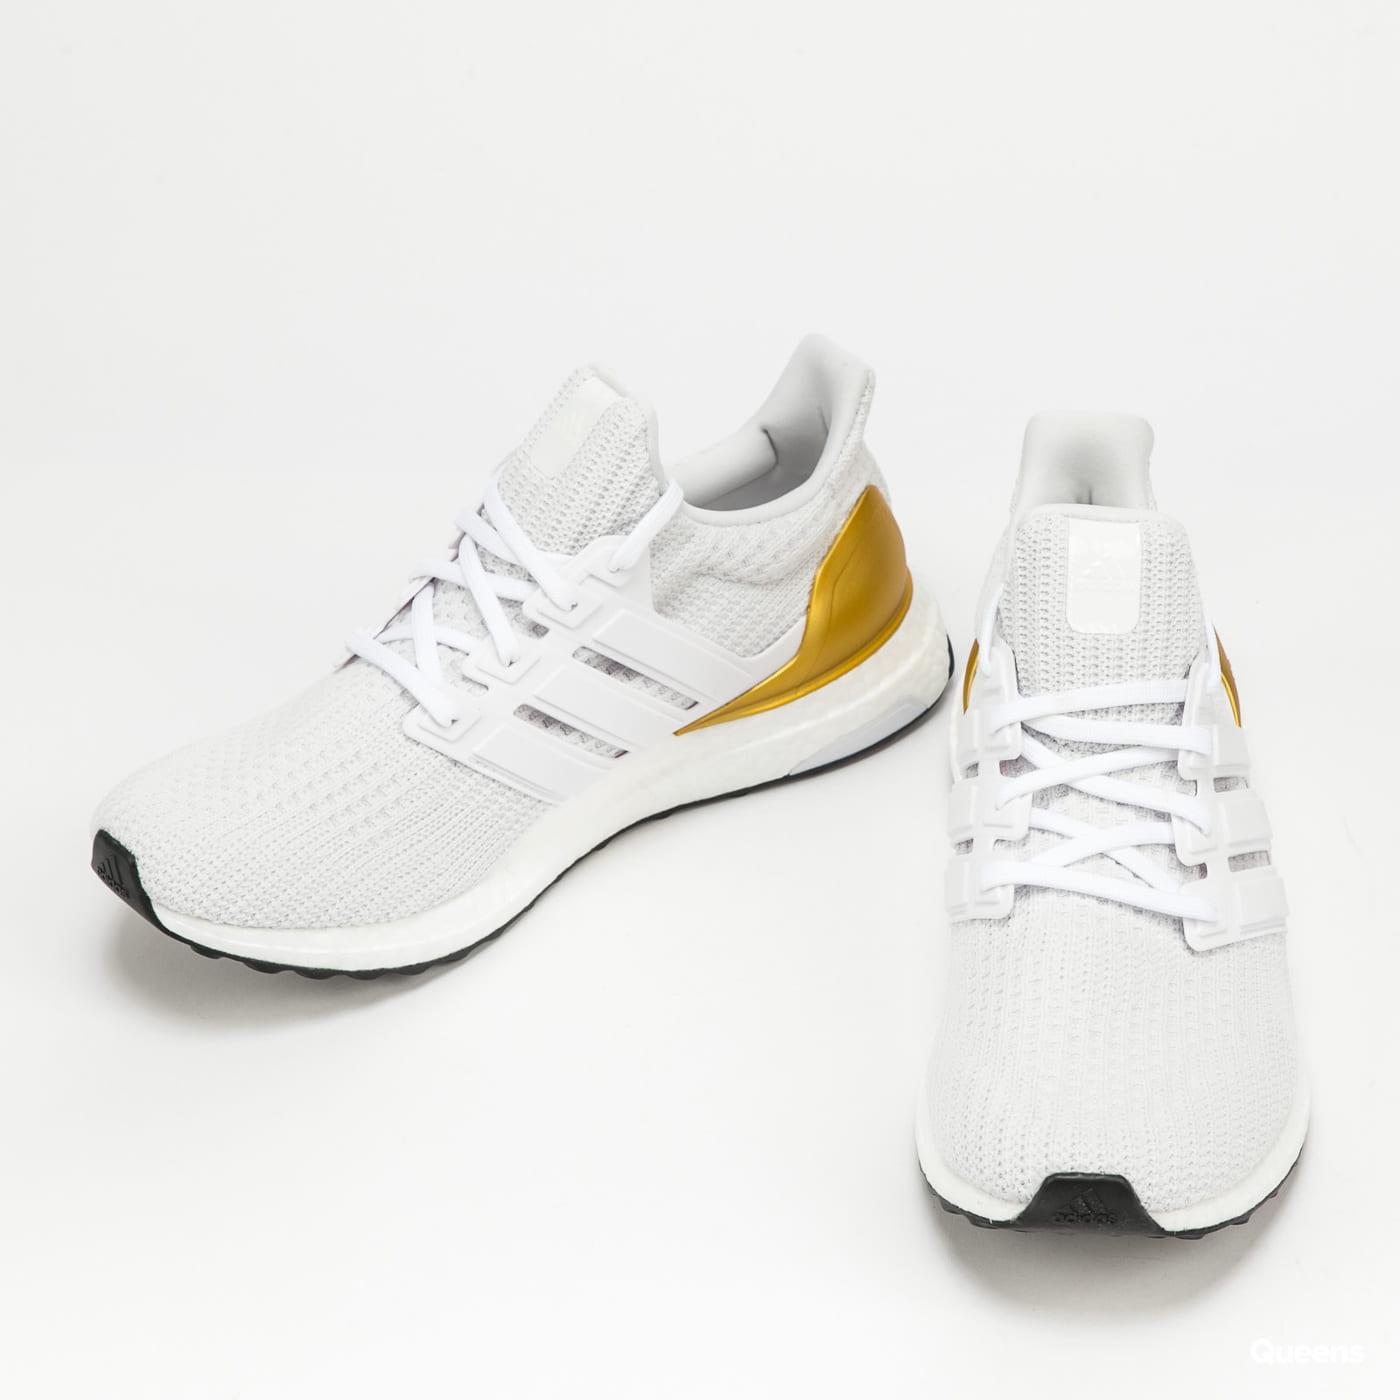 adidas Performance Ultraboost 4.0 DNA ftwwht / ftwwht / goldmt